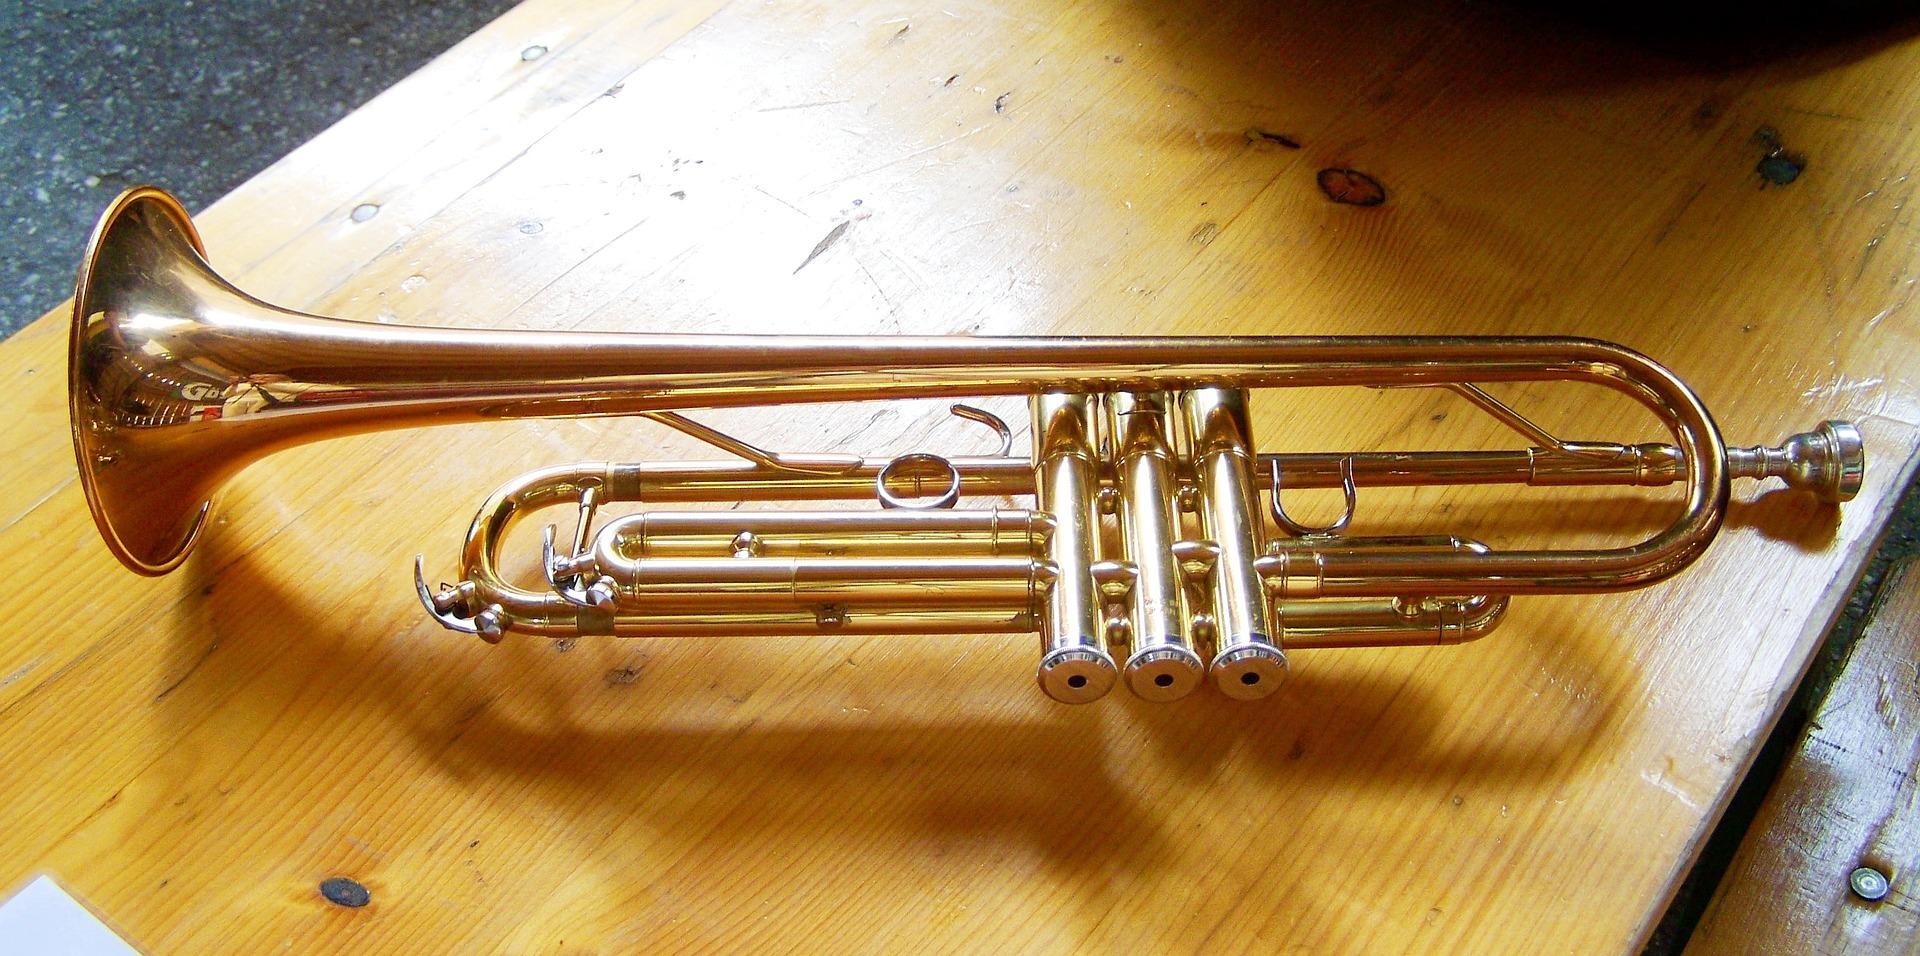 Yamaha YTR-2330 Standard trumpet